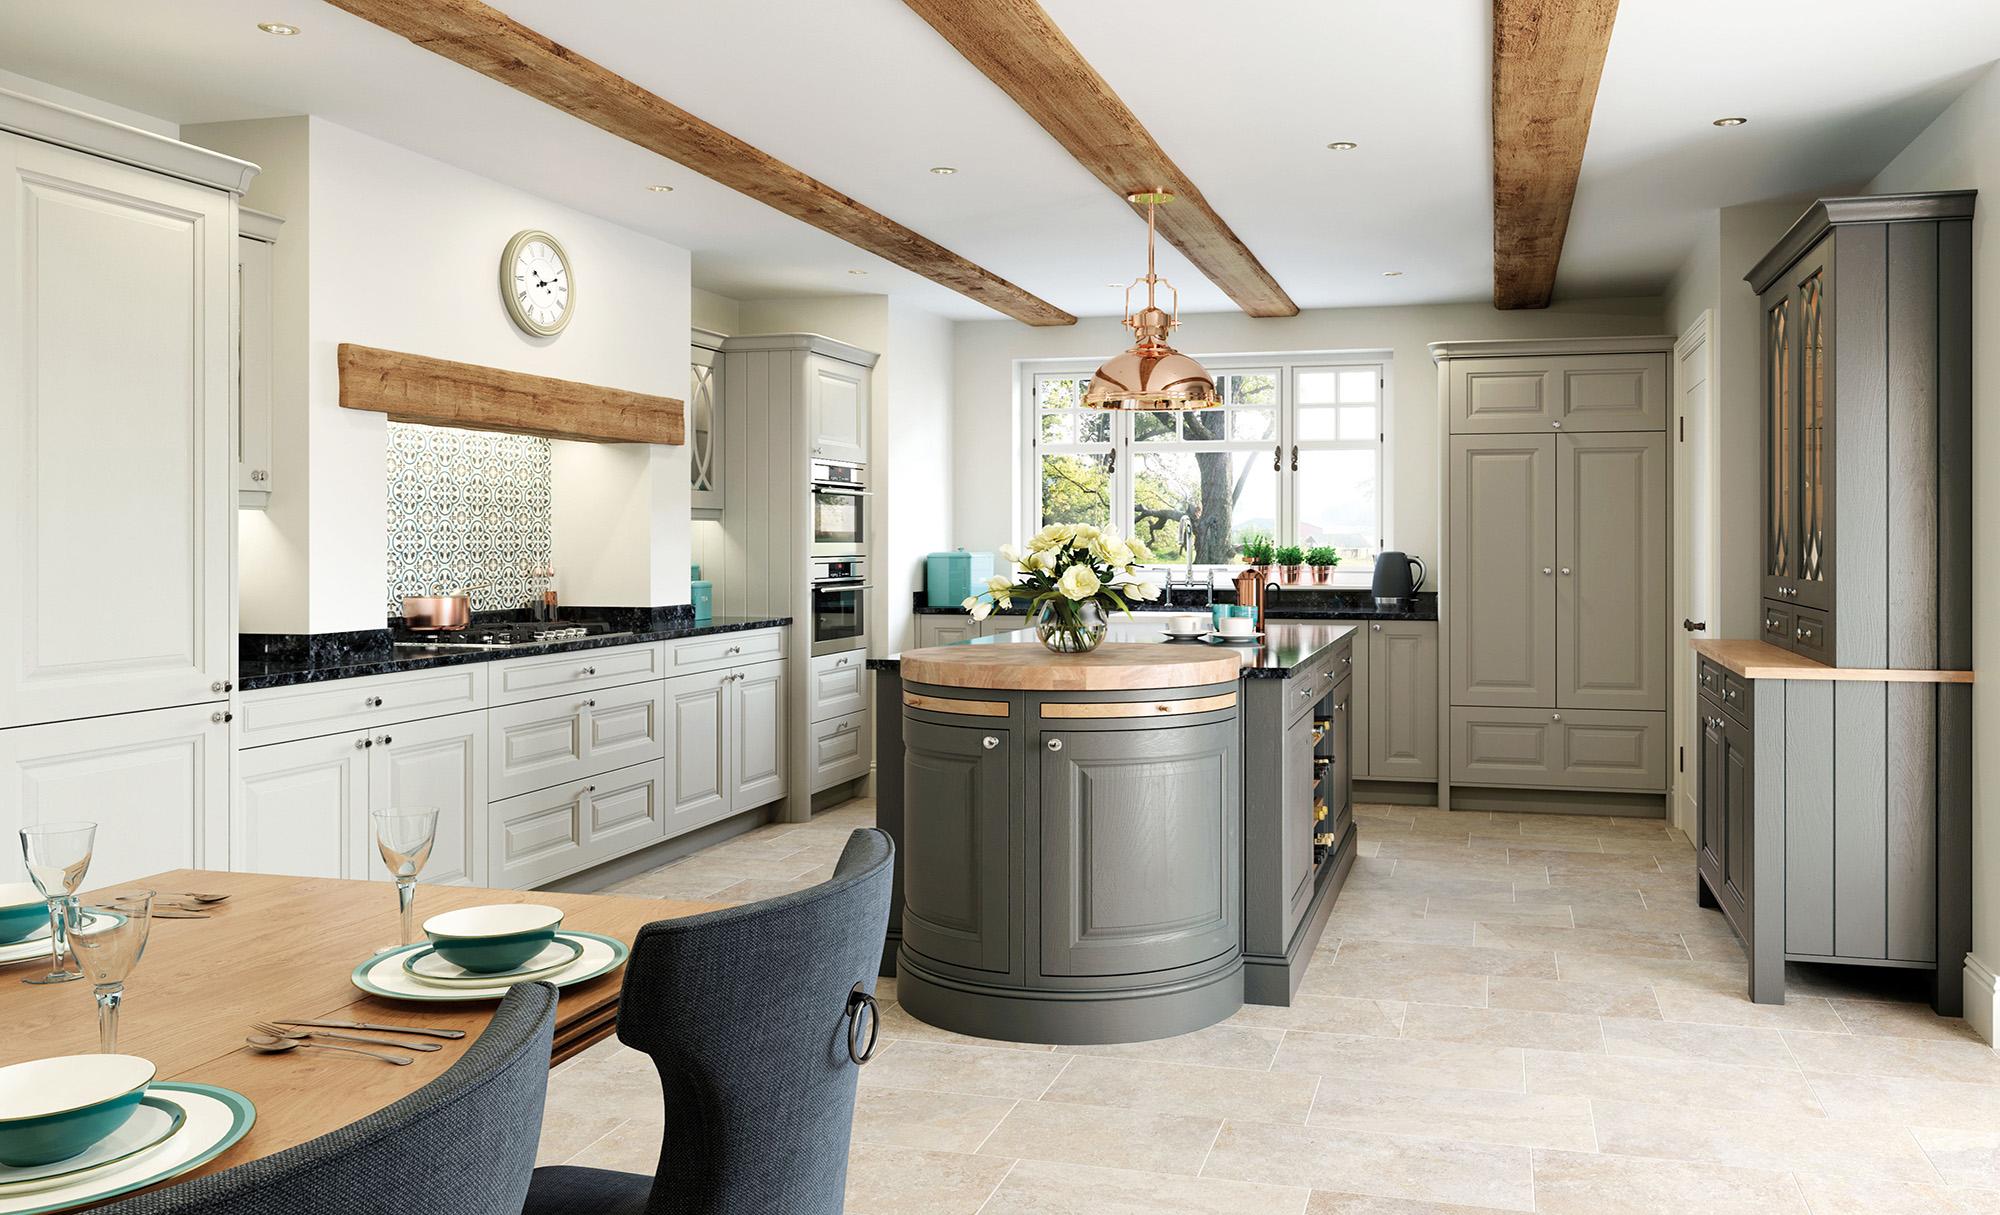 Country Classic Traditional Kitchen - Jefferson Stone and Gun Metal Grey Kitchen - Kitchen Design - Alan Kelly Kitchens - Waterford